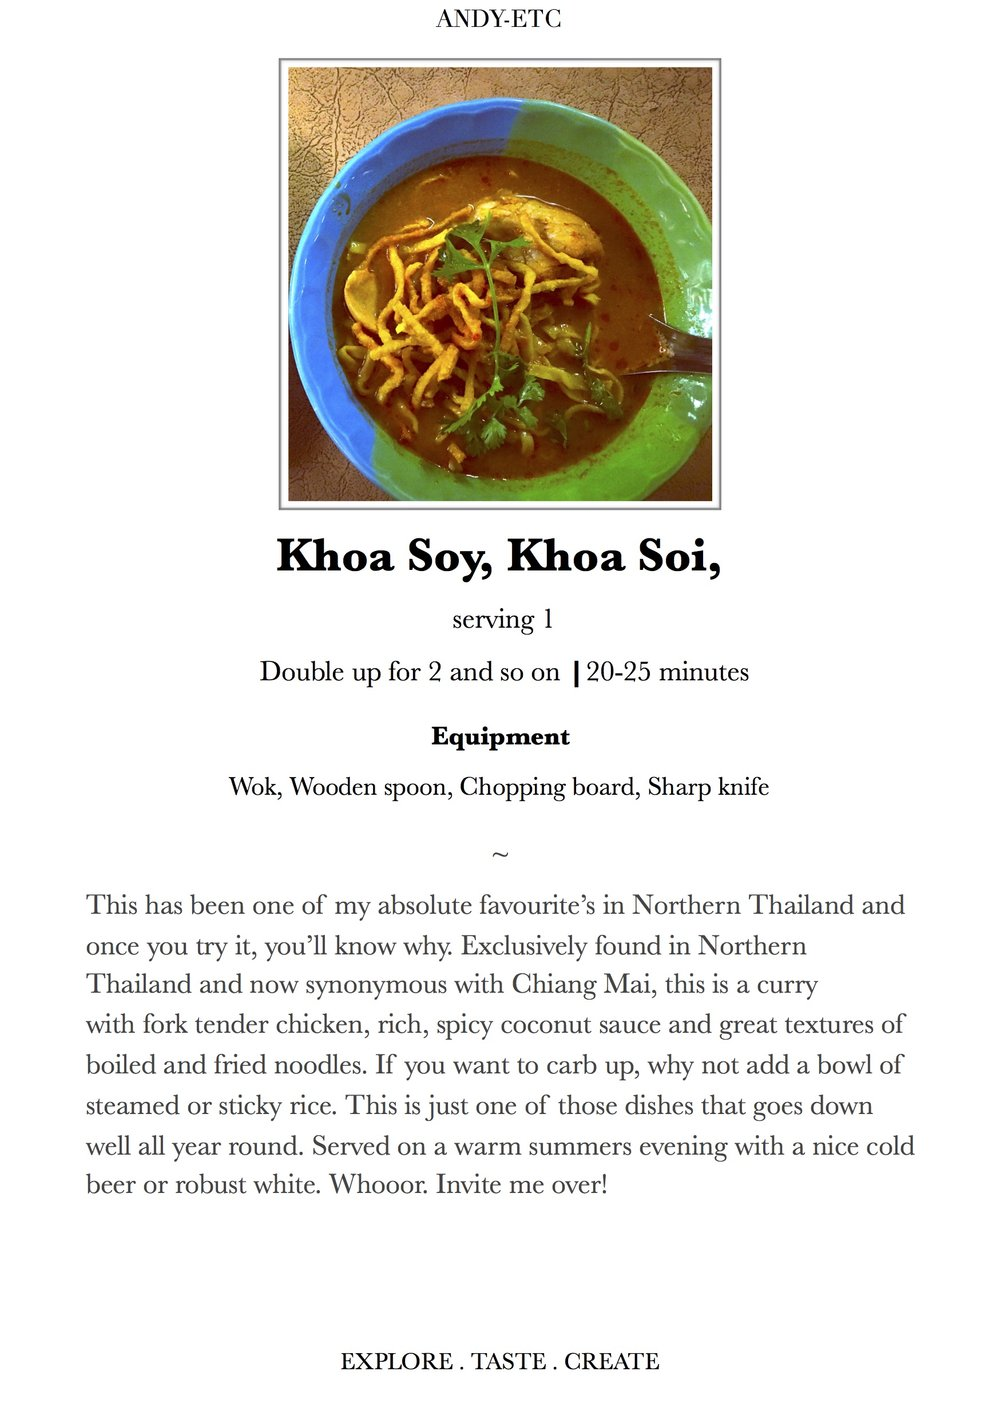 Khao Soy recipe blog post.jpg